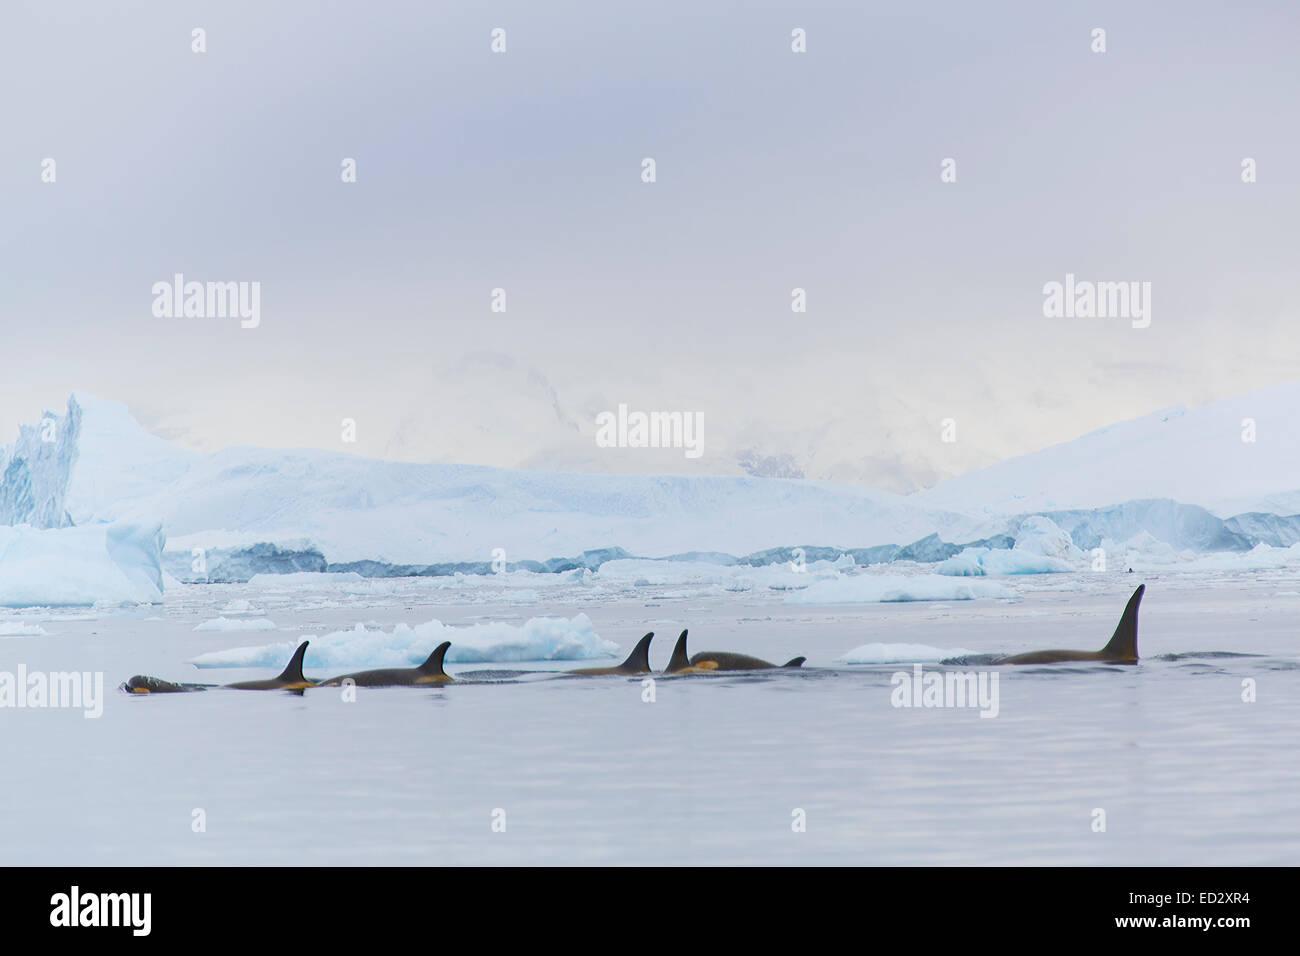 L'épaulard, Neko Harbour, l'Antarctique. Photo Stock